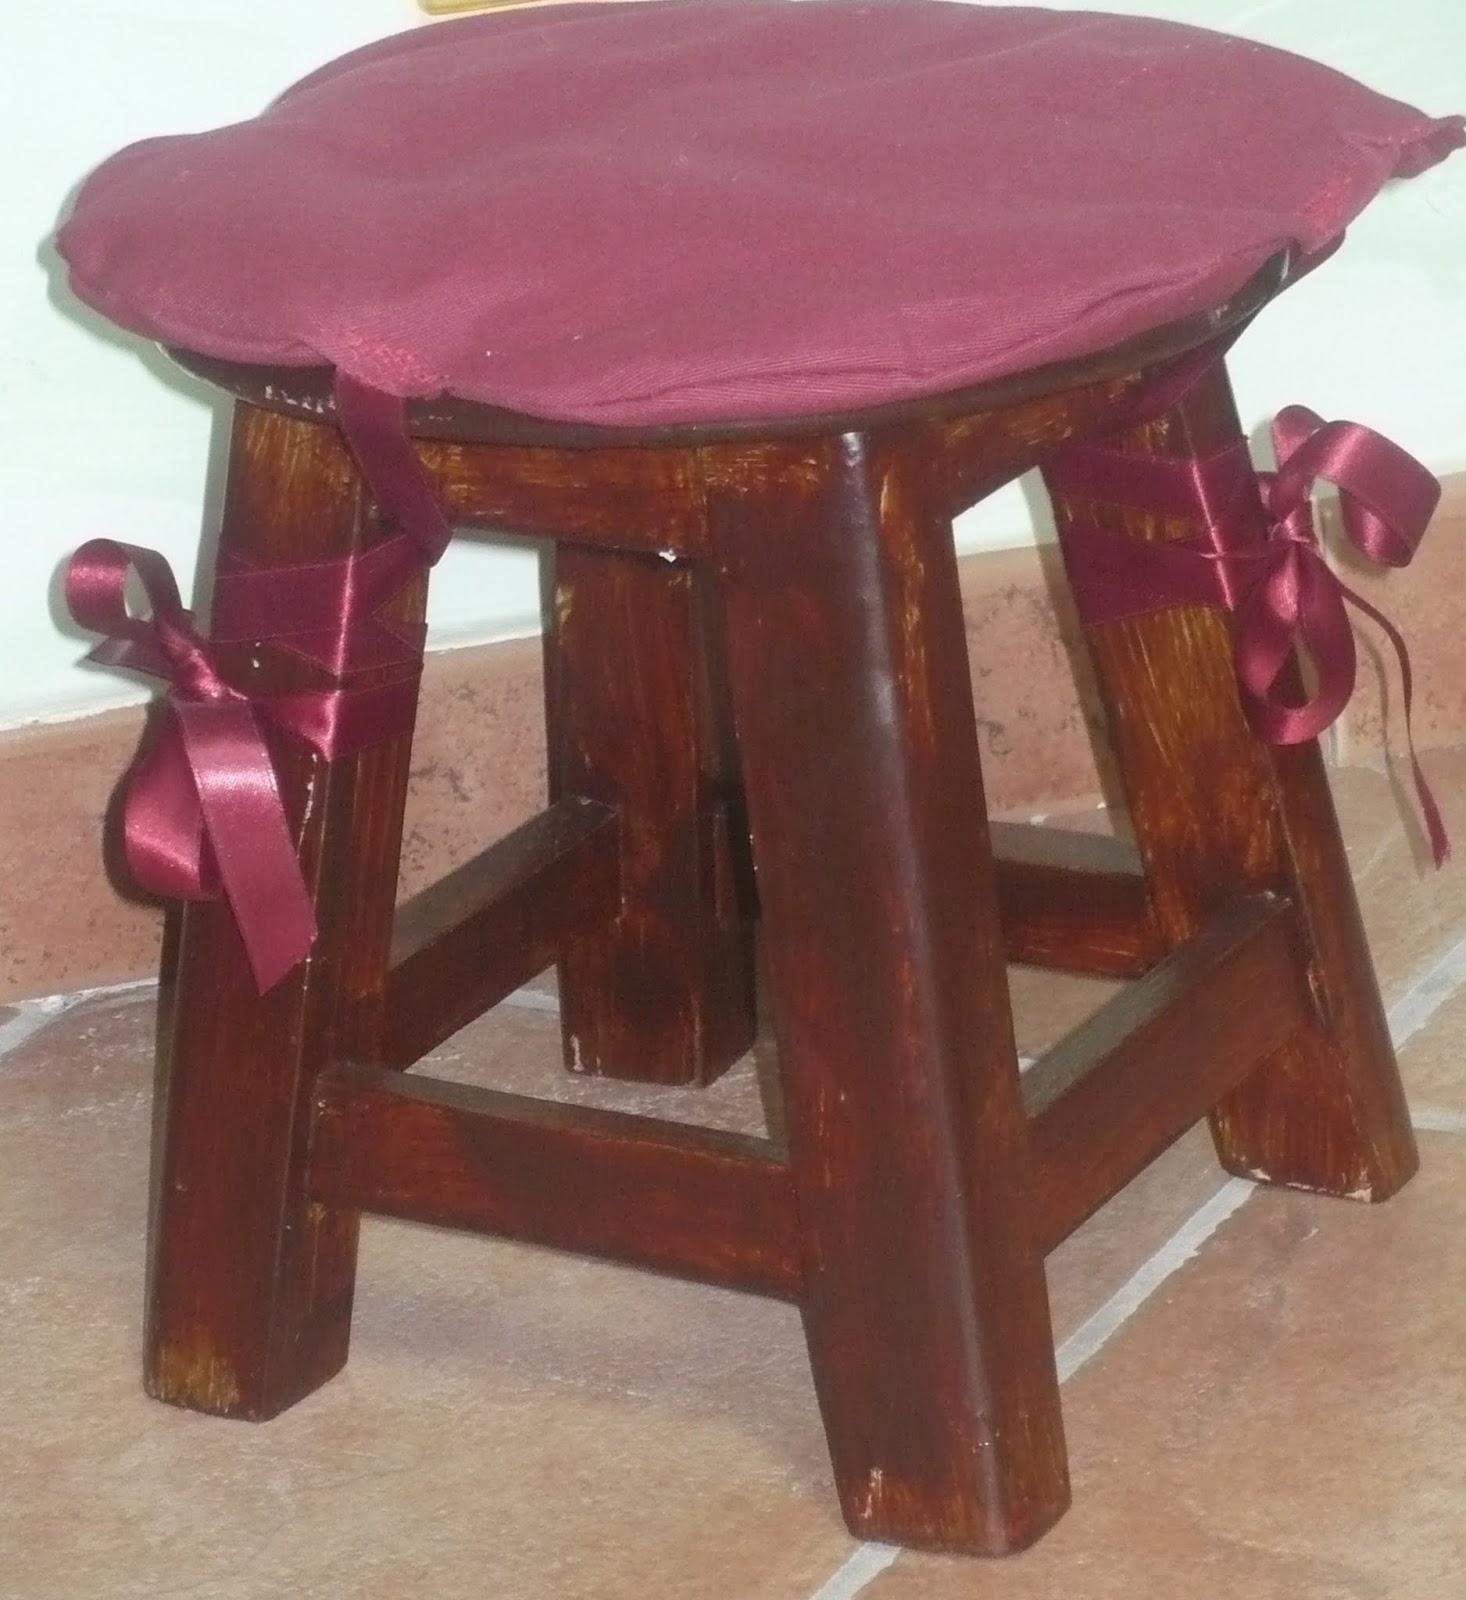 Italian cooking restaurare i vecchi mobili - Restaurare vecchi mobili ...